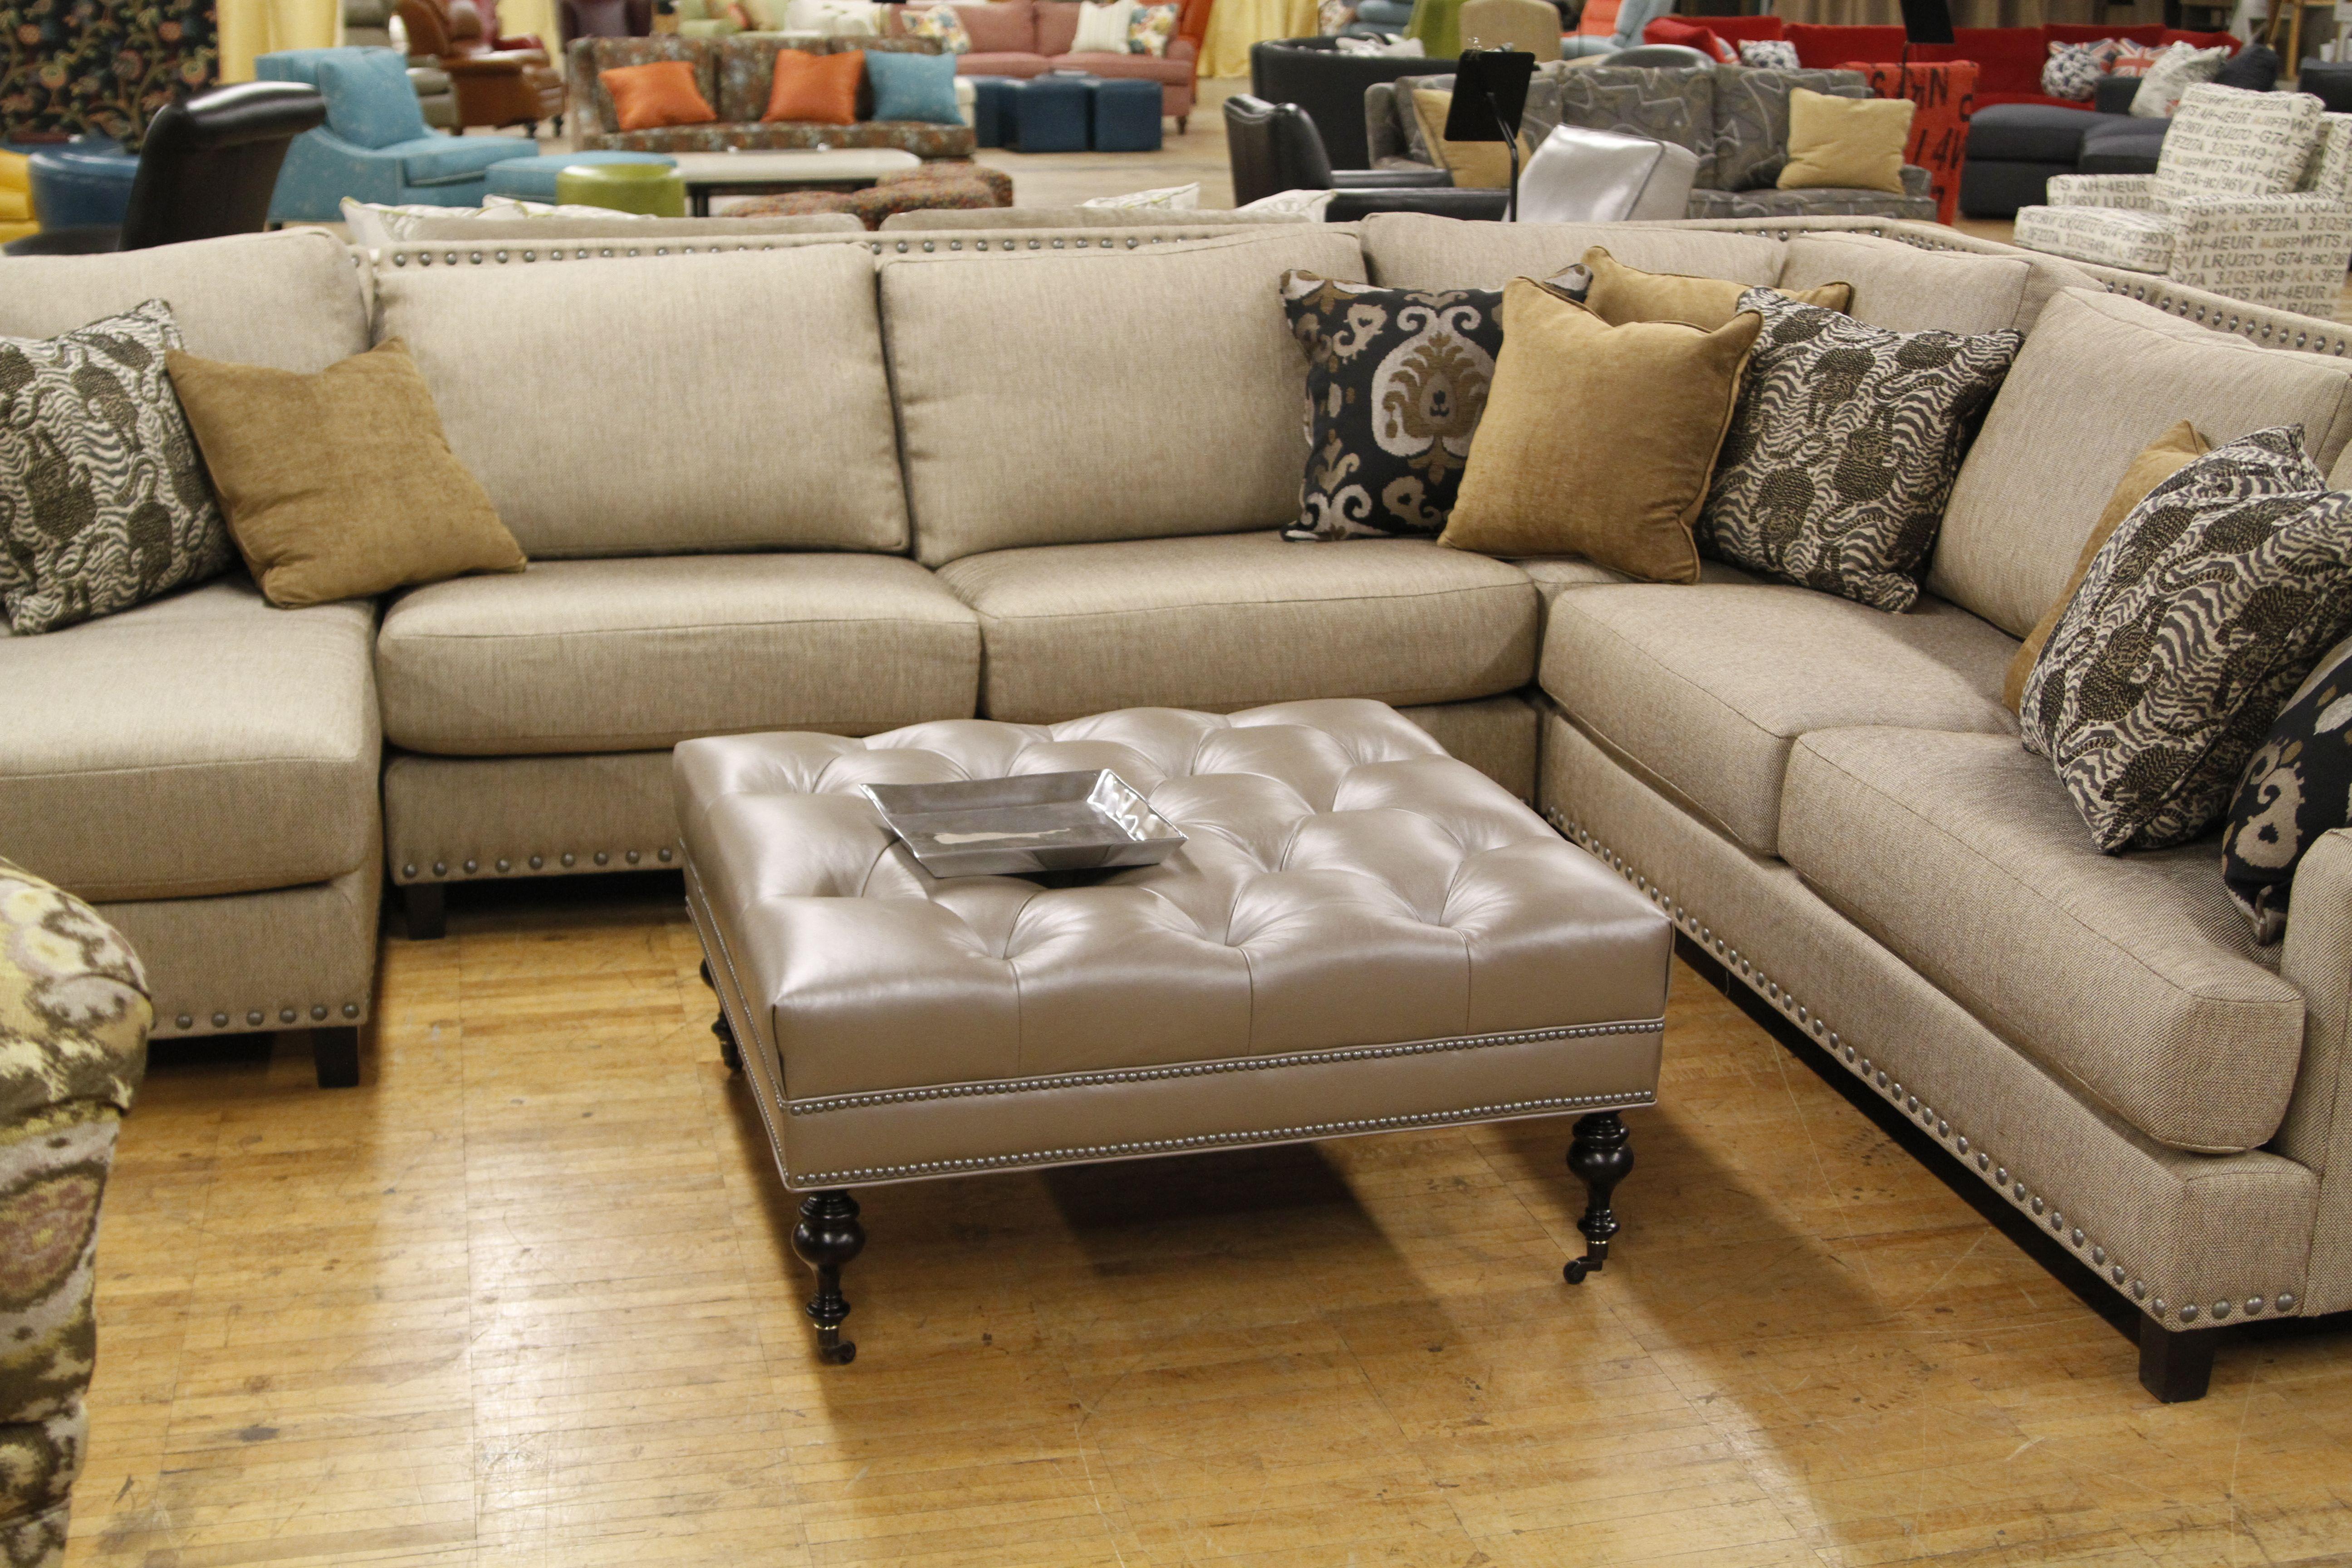 norwalk sofa and chair leopard high heel shoe leather furniture deals phelan s cedar rapids